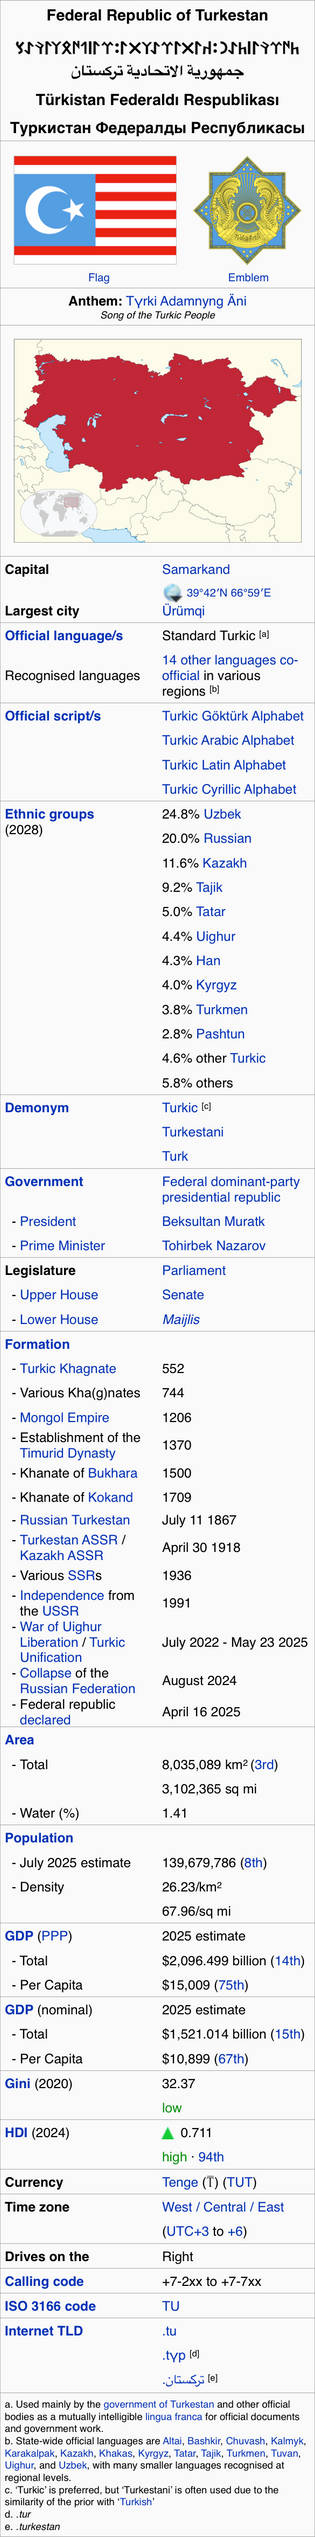 Federal Republic of Turkestan Info-box